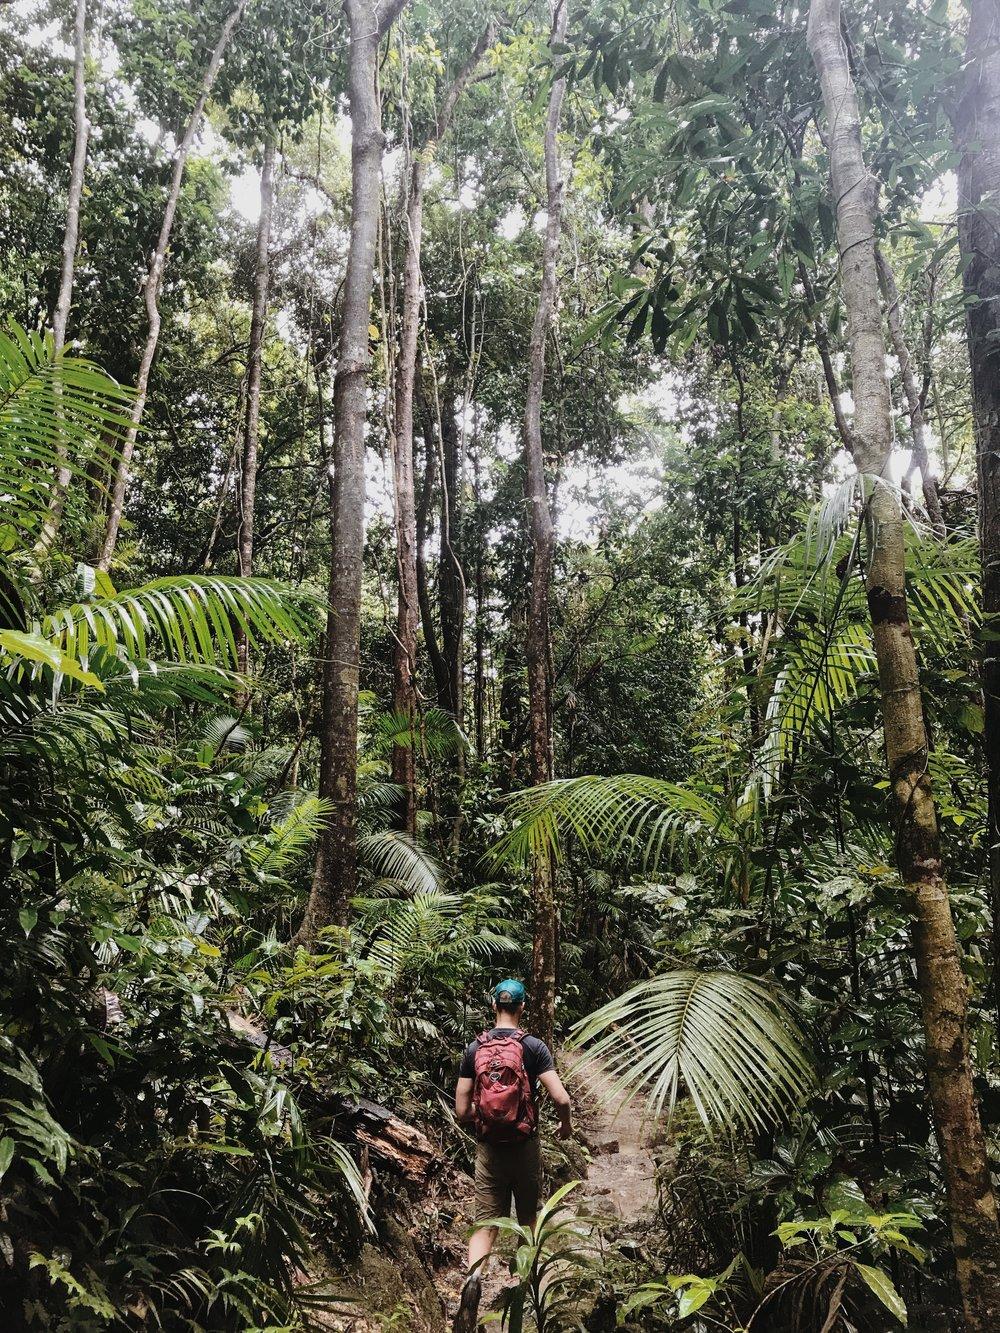 The dense jungle canopies of Mossman Gorge